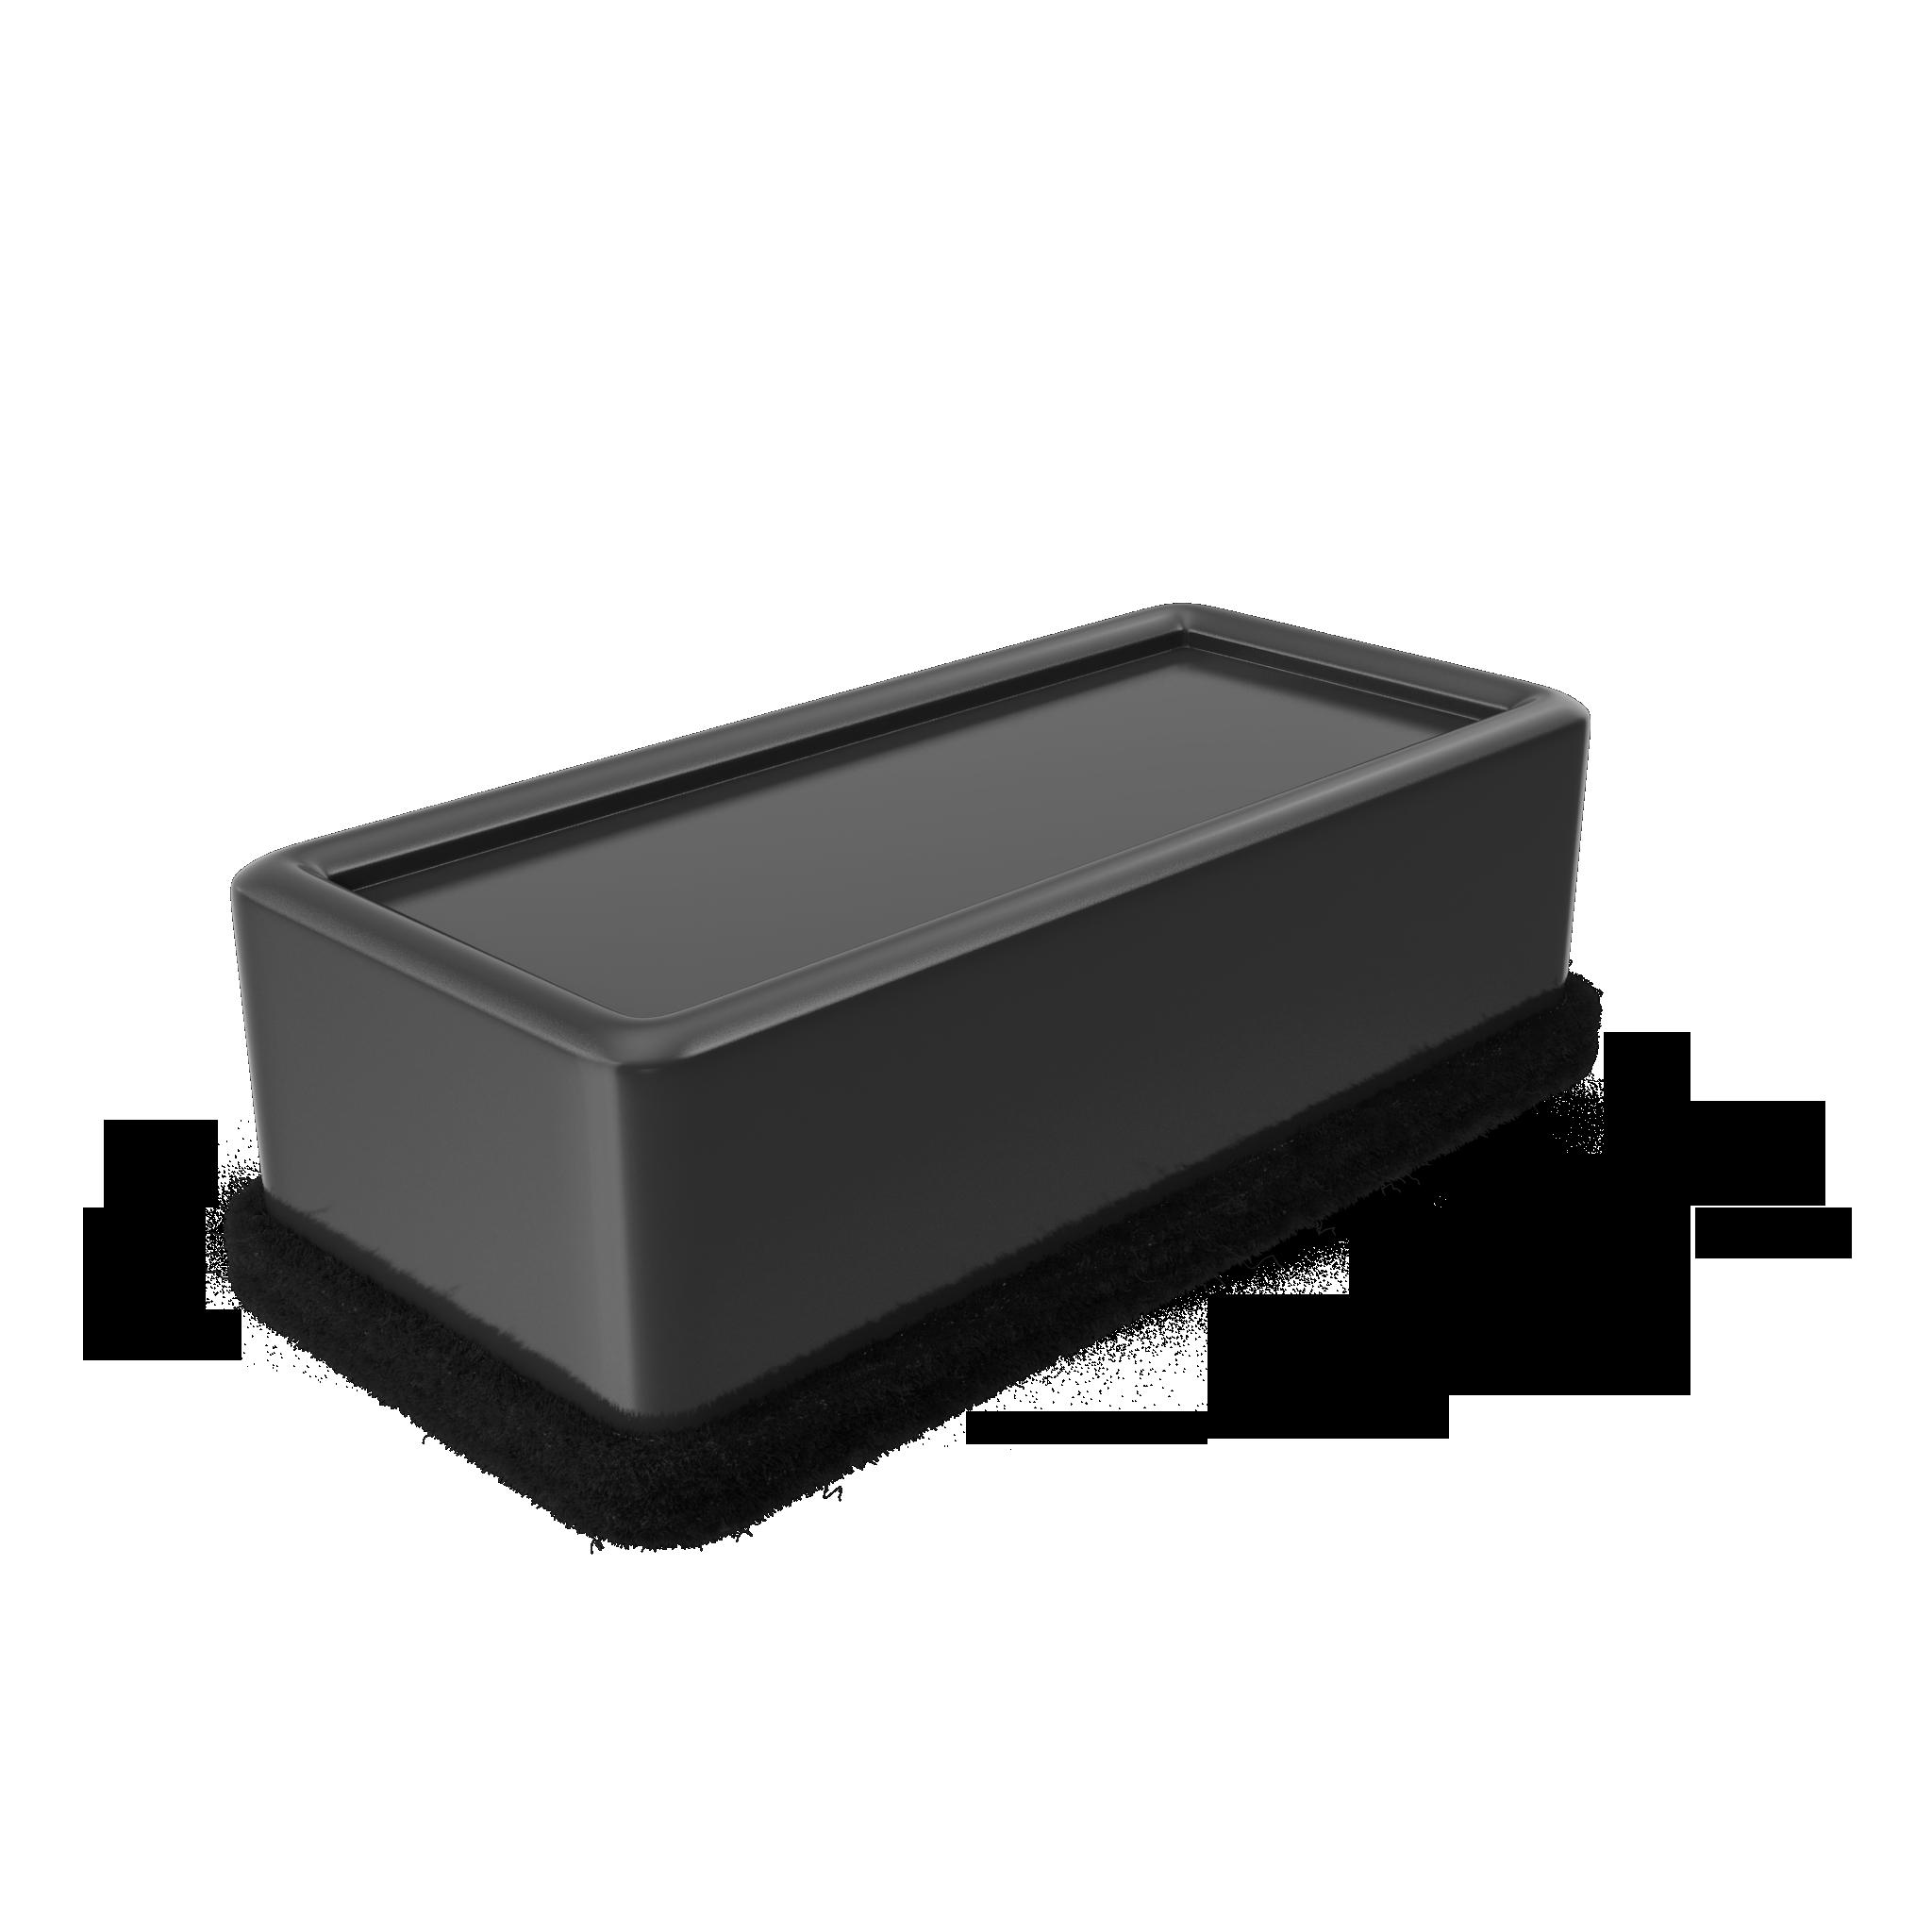 freeuse download Chalkboard eraser an transprent. Chalk clipart whiteboard duster.